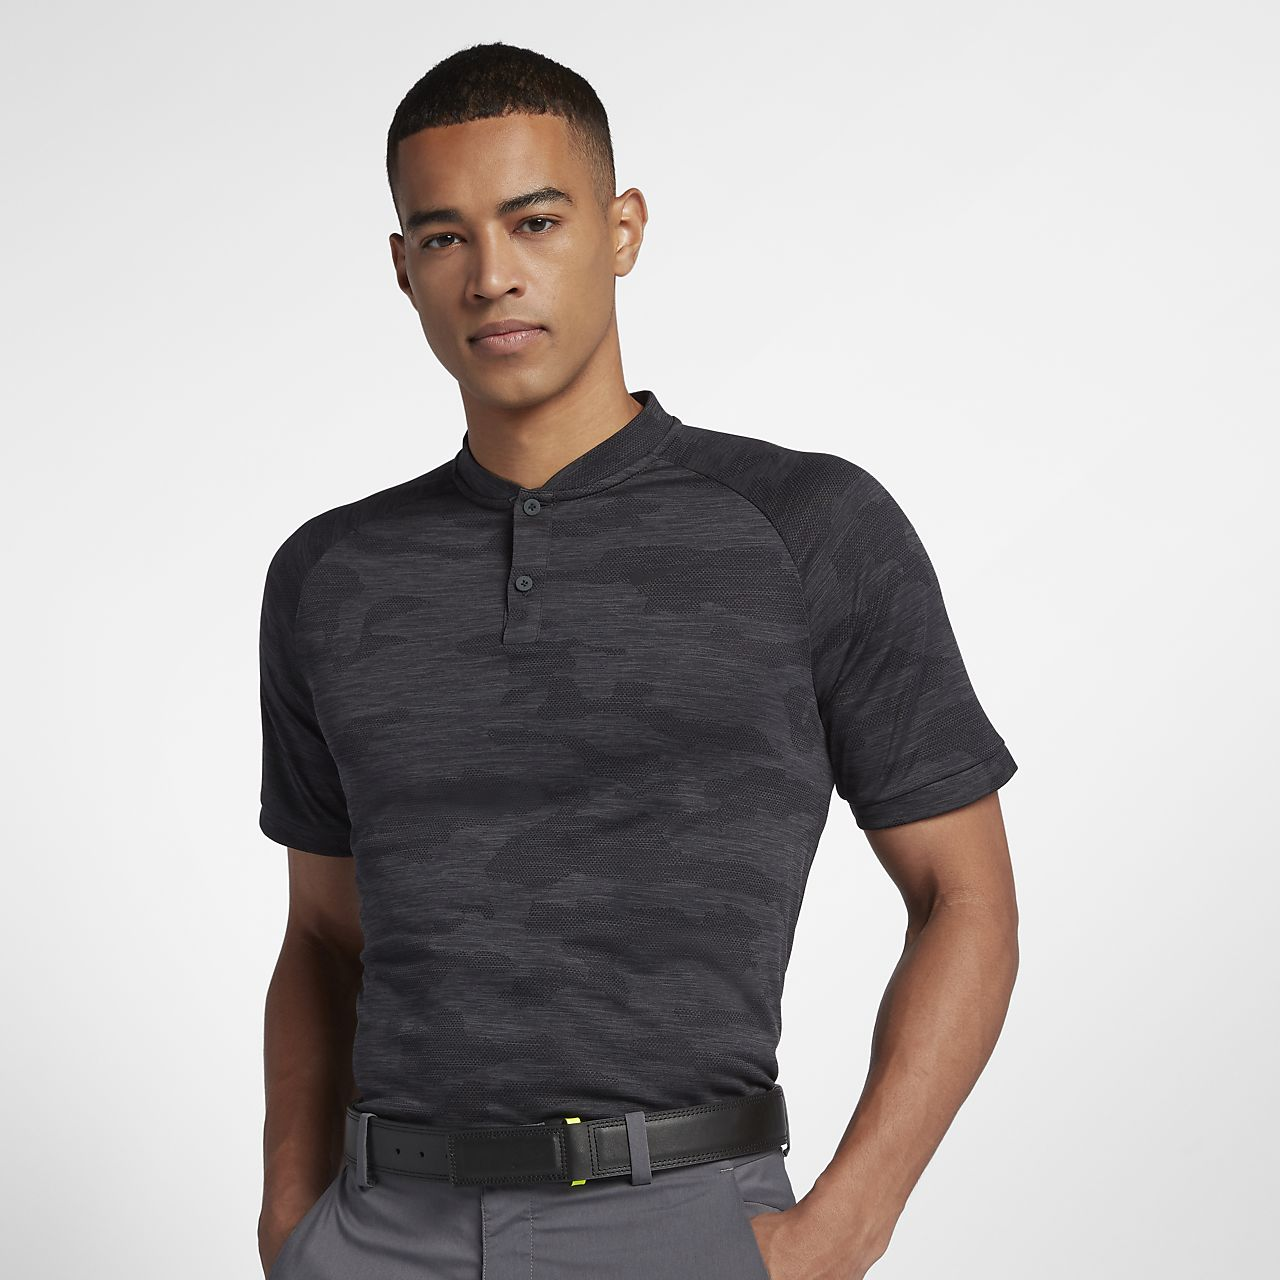 Nike Zonal Cooling TW Men's Camo Golf Polo